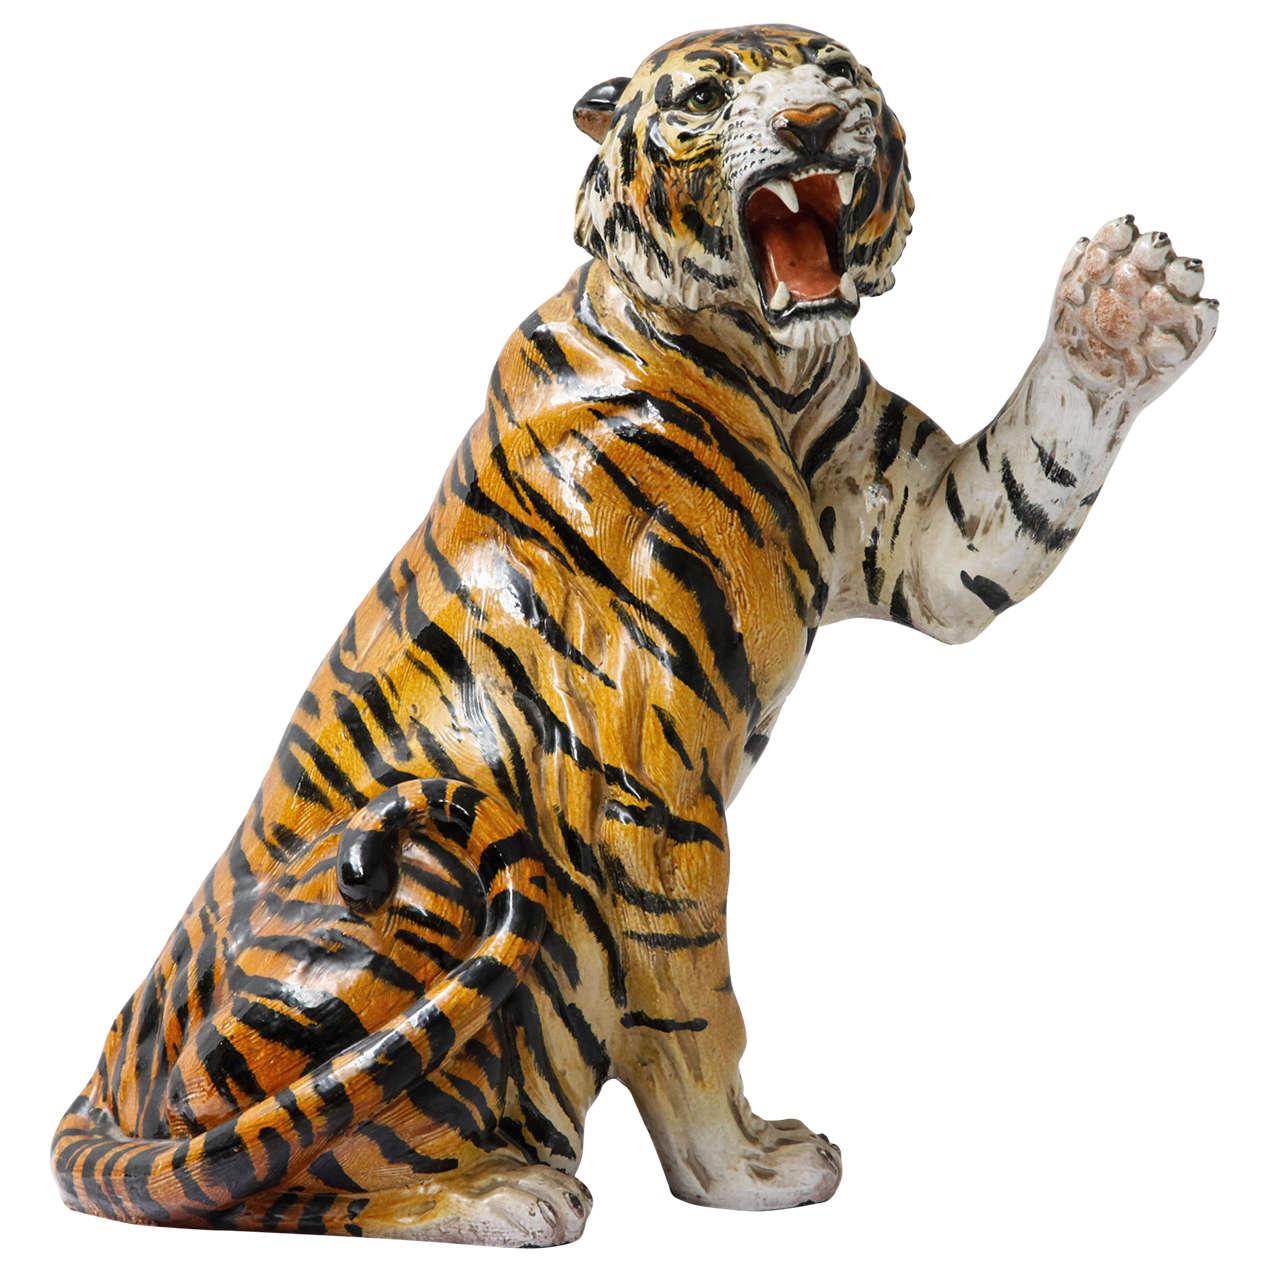 Life Size Ceramic Tiger Statue, 1970s at 1stdibs